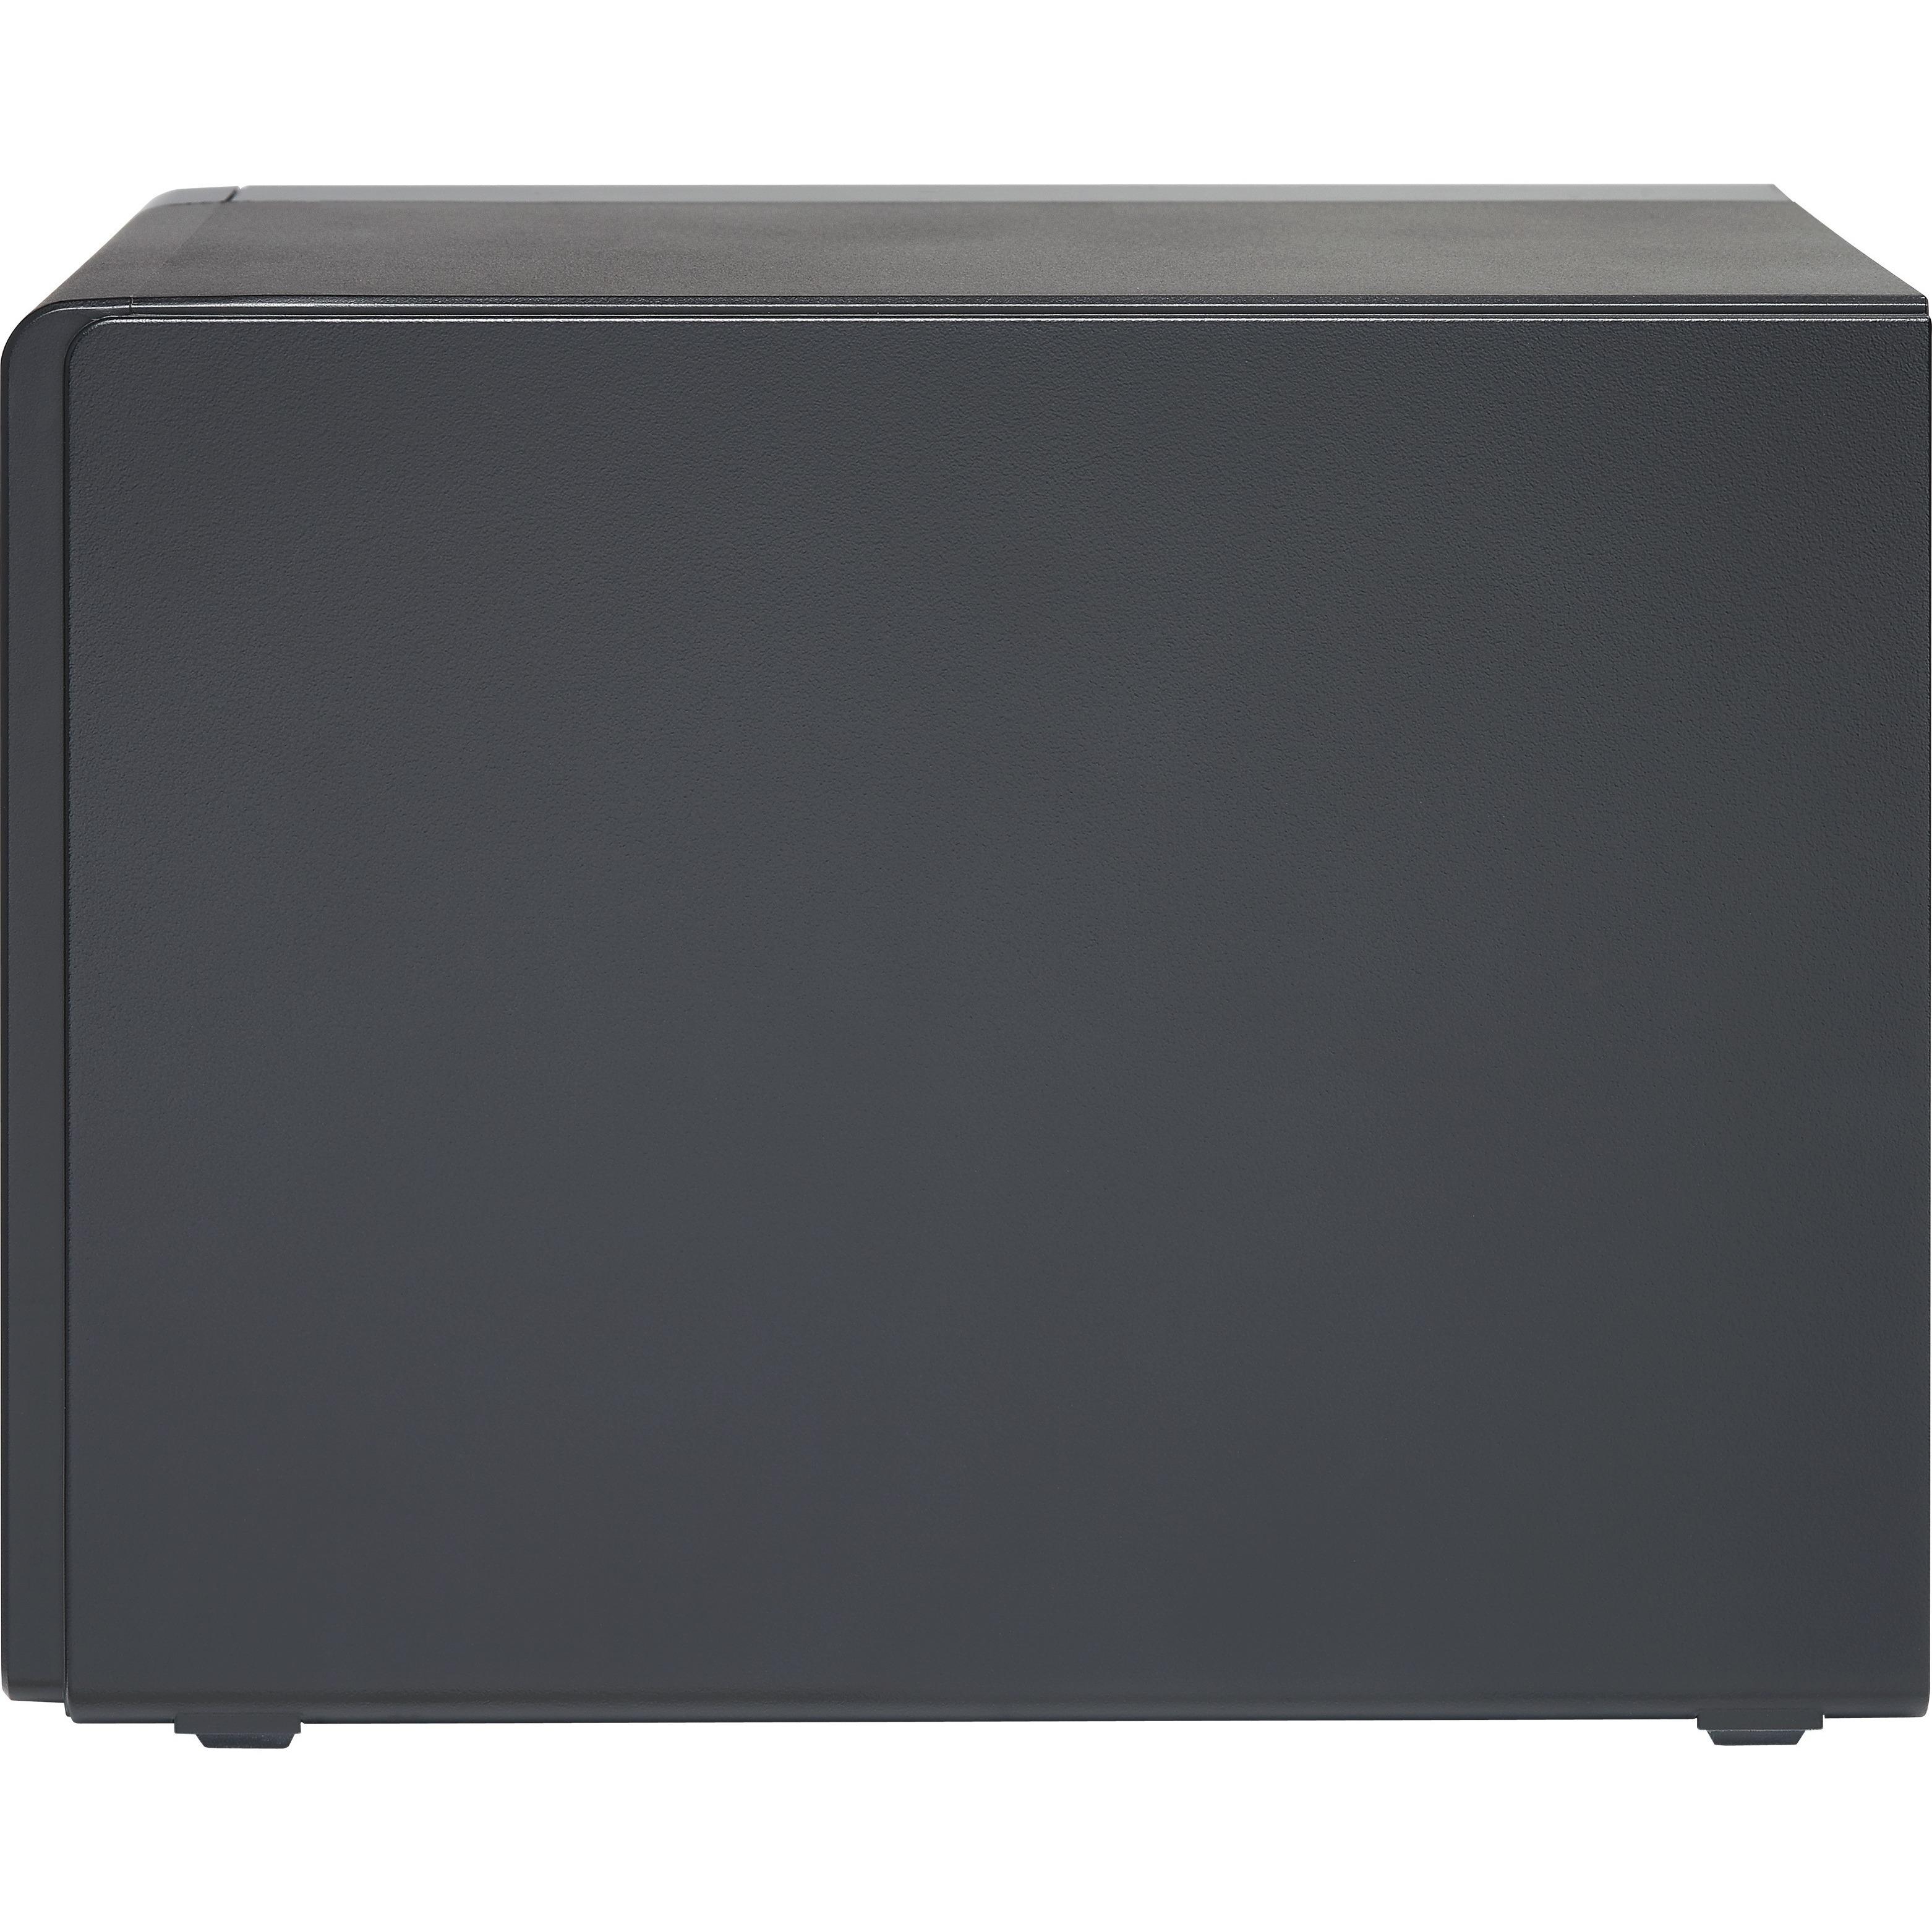 QNAP Turbo NAS TS-451plus 4x Total Bays SAN/NAS 8GB RAM Storage System